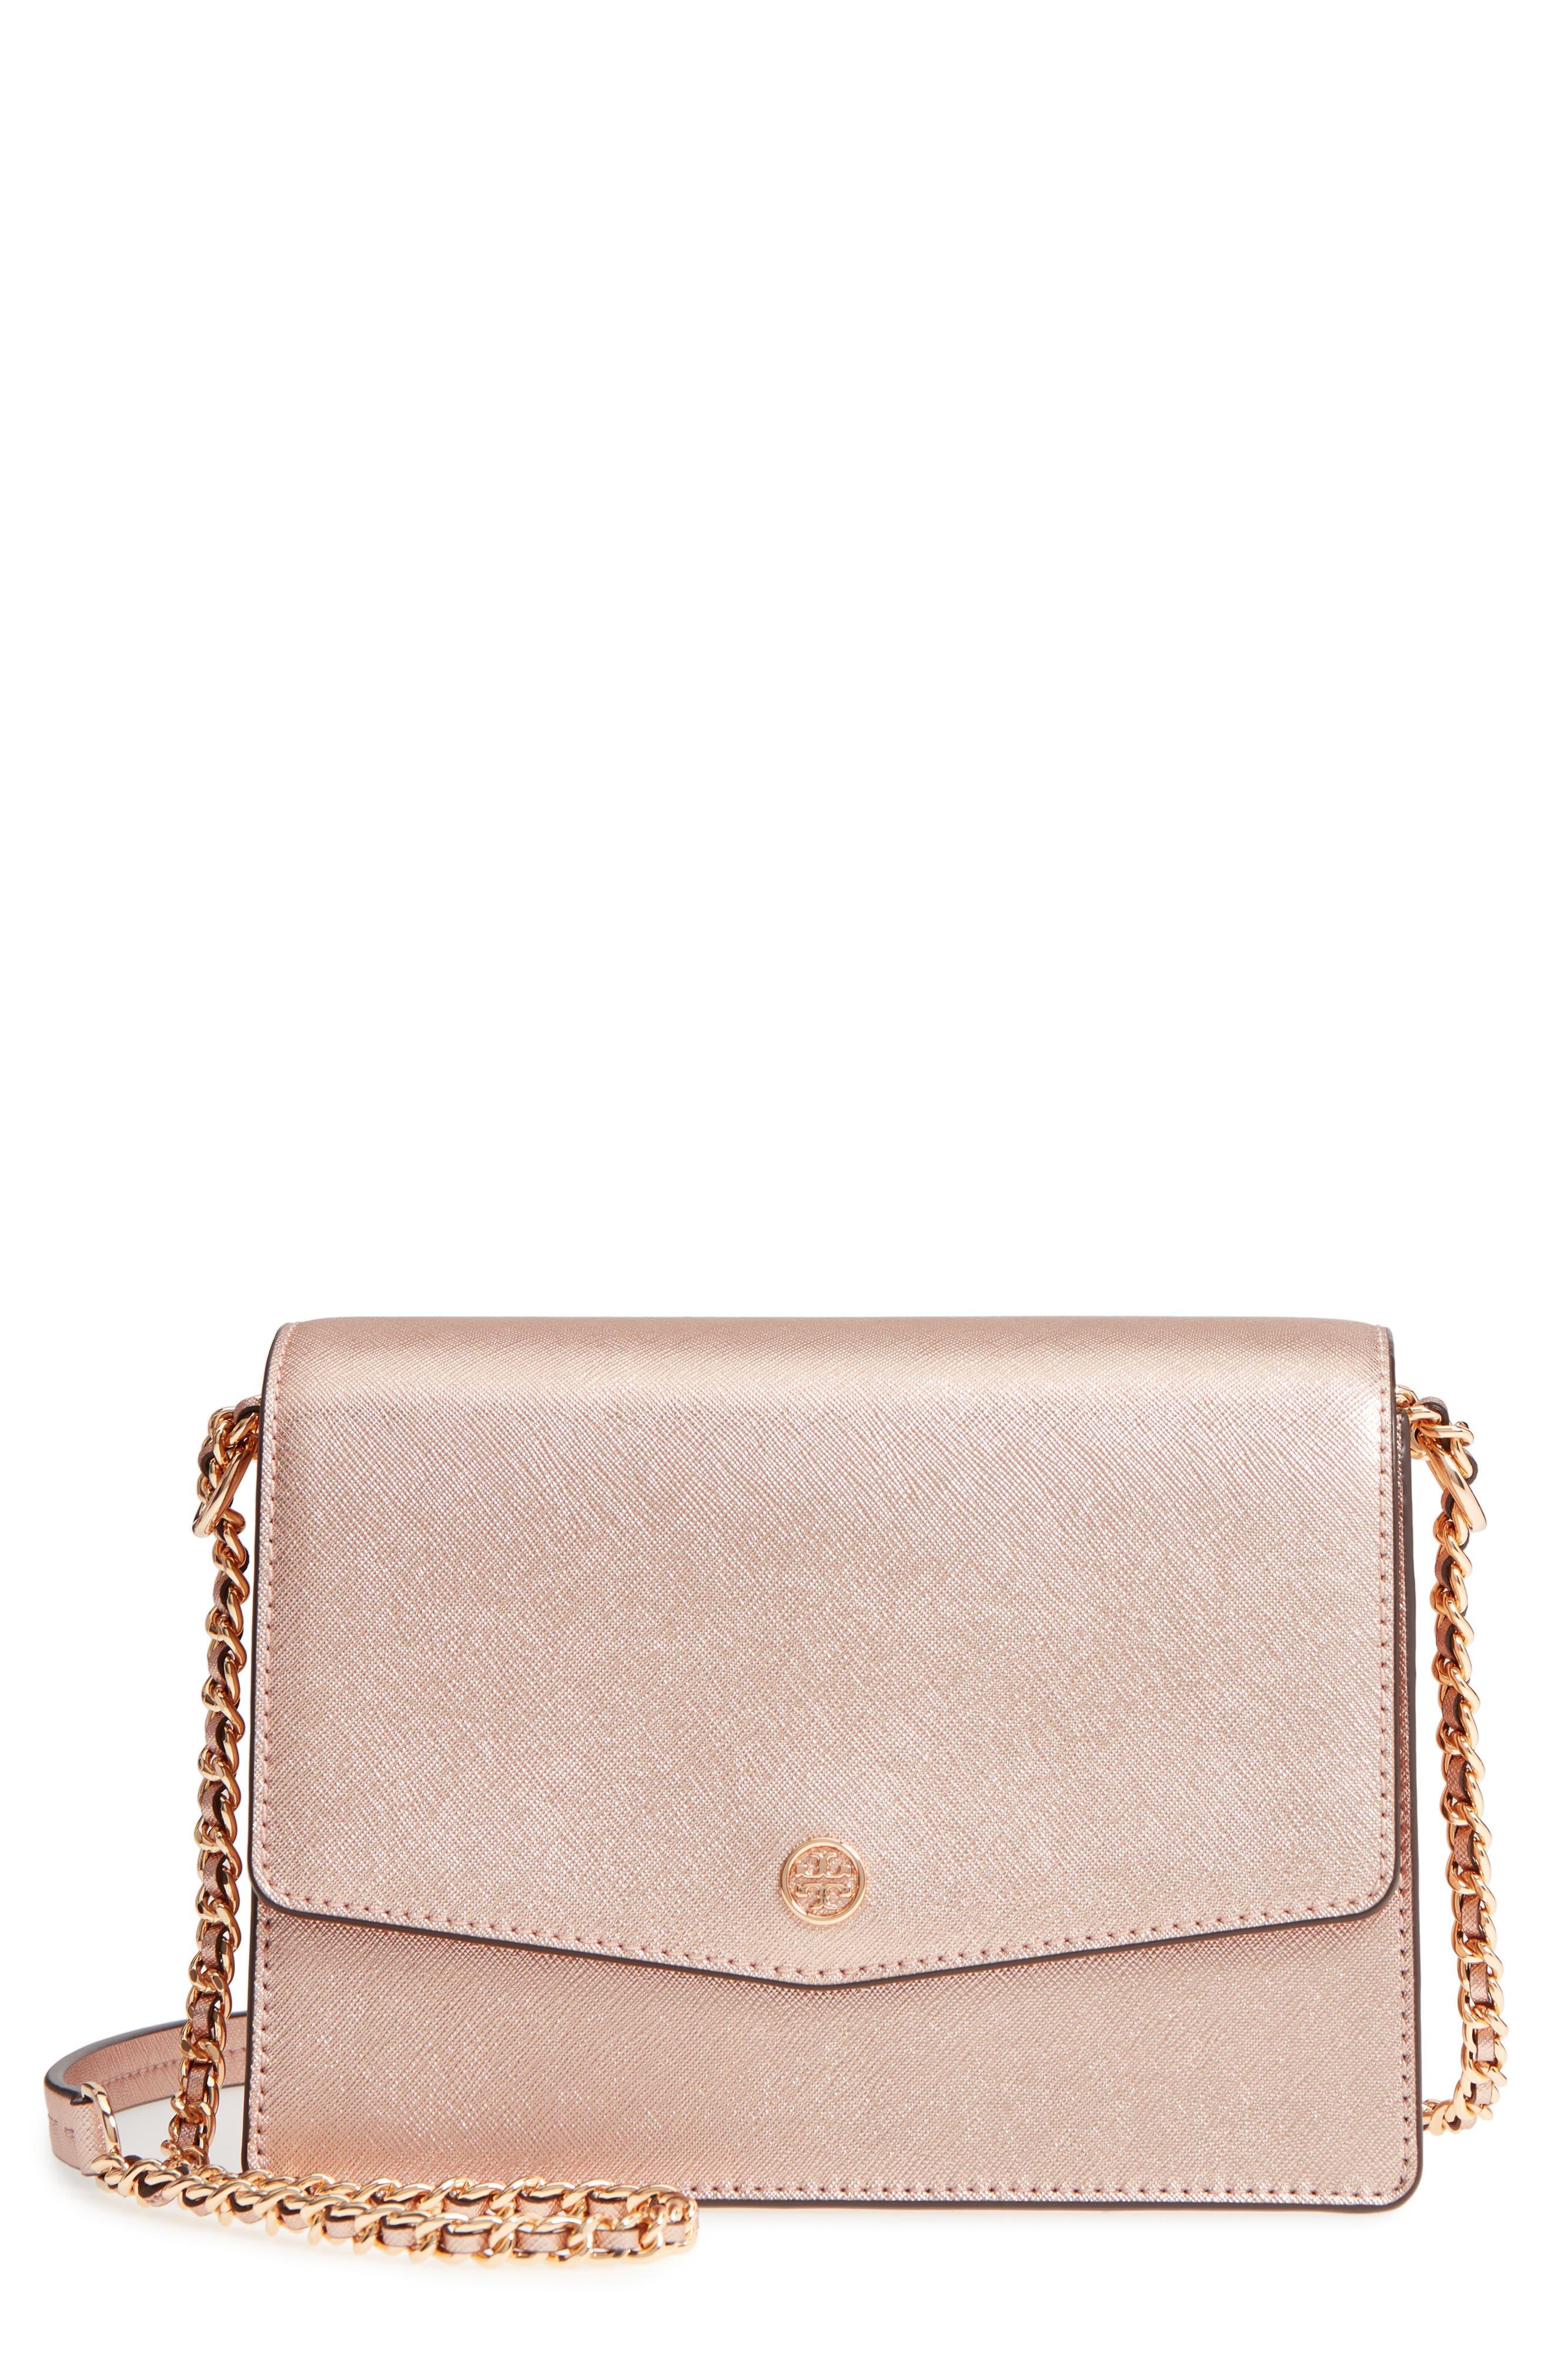 Robinson Convertible Metallic Leather Shoulder Bag,                         Main,                         color, LIGHT ROSE GOLD